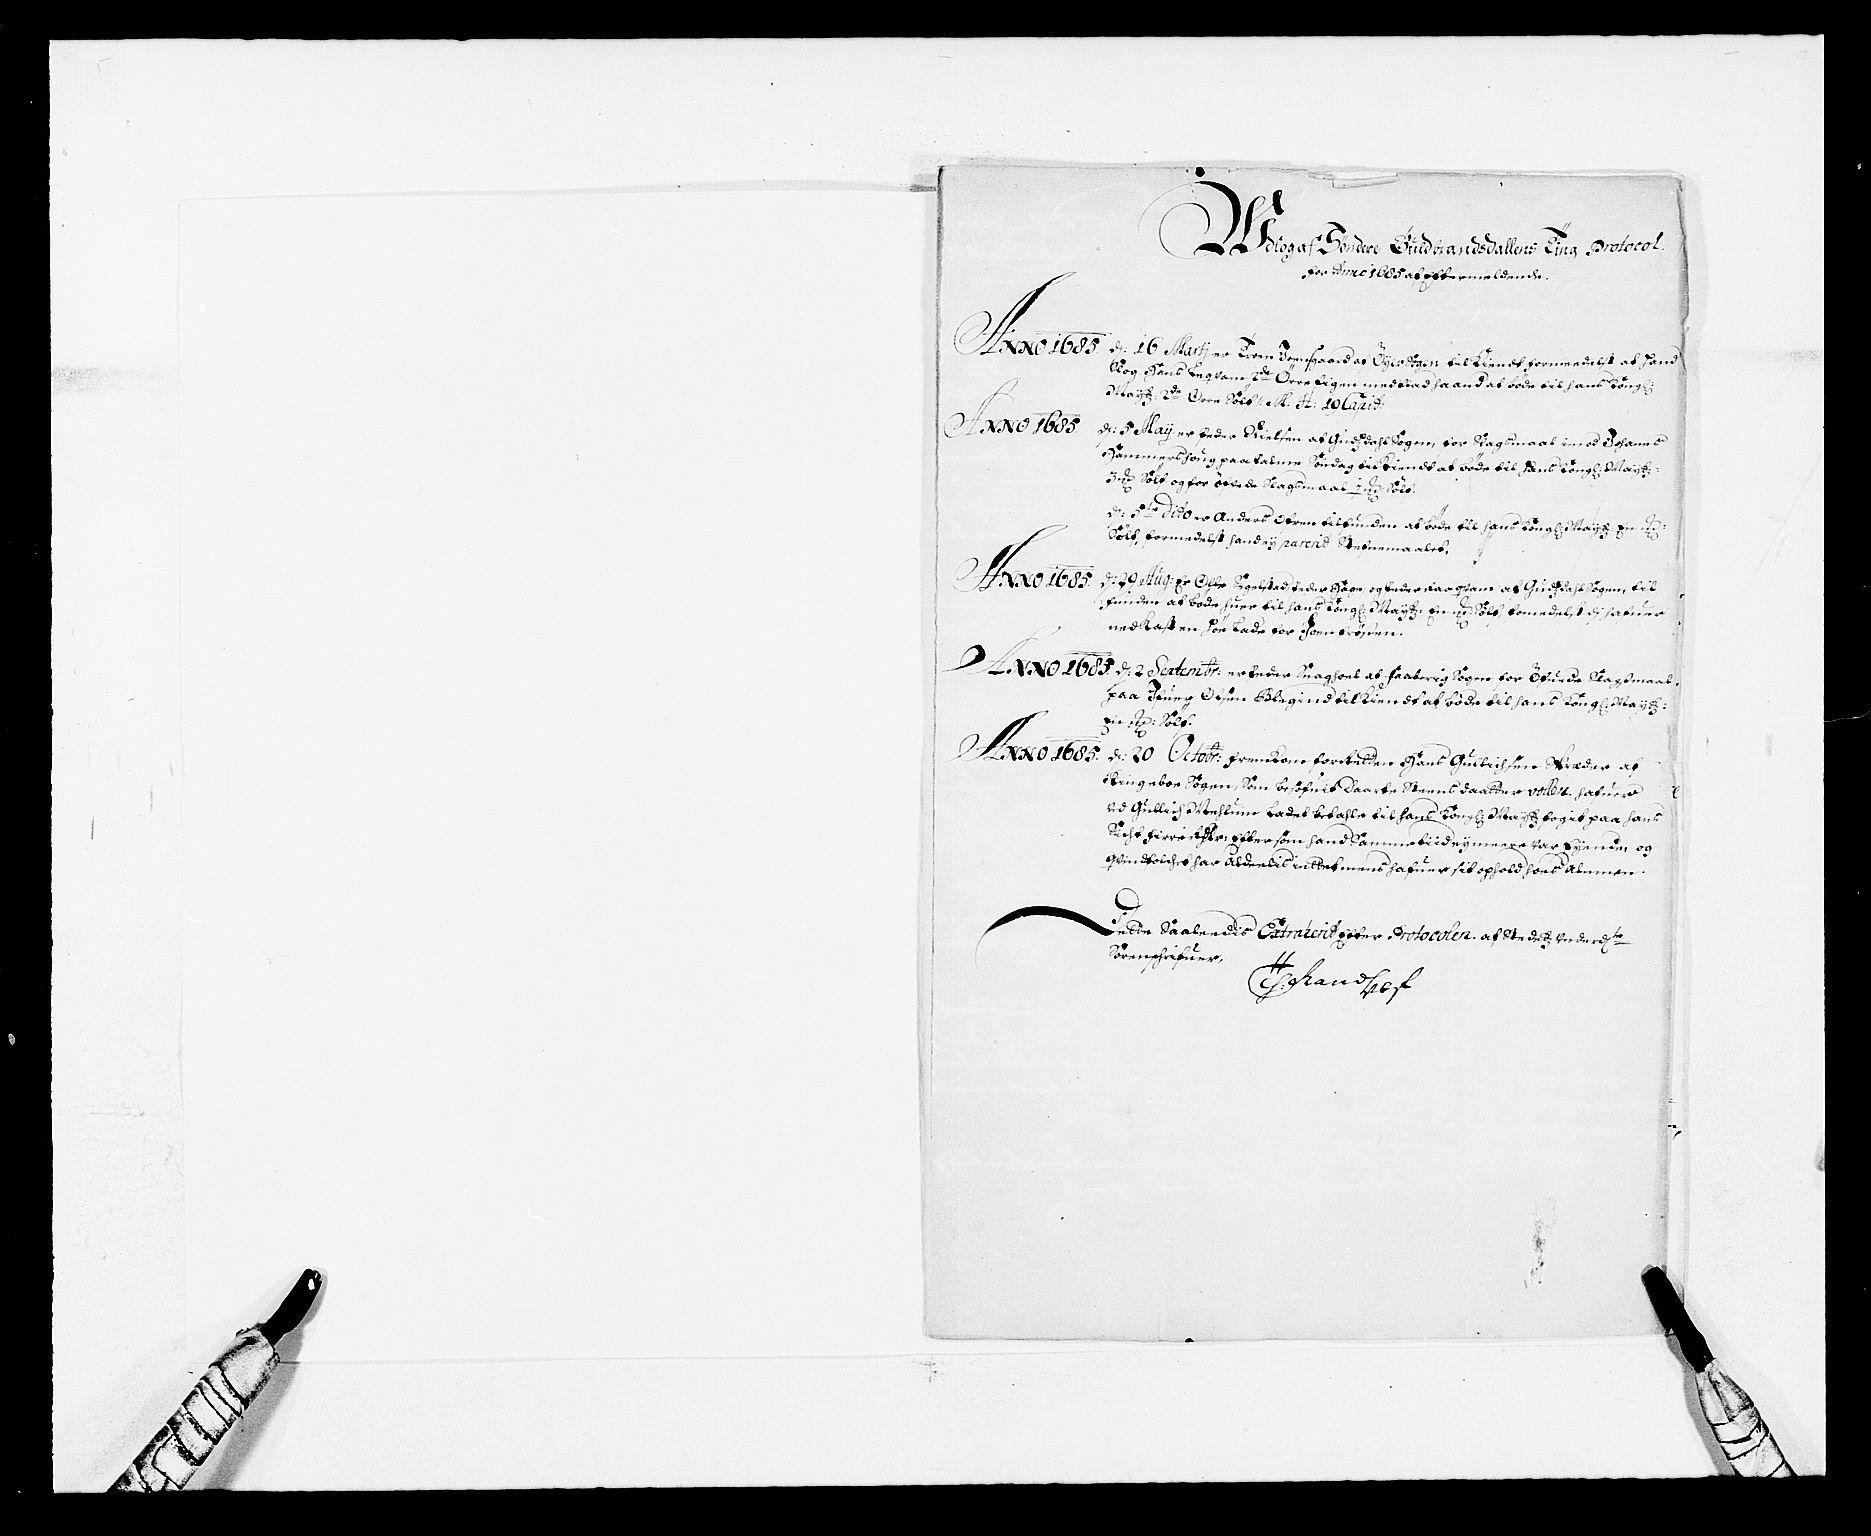 RA, Rentekammeret inntil 1814, Reviderte regnskaper, Fogderegnskap, R17/L1160: Fogderegnskap Gudbrandsdal, 1682-1689, s. 273